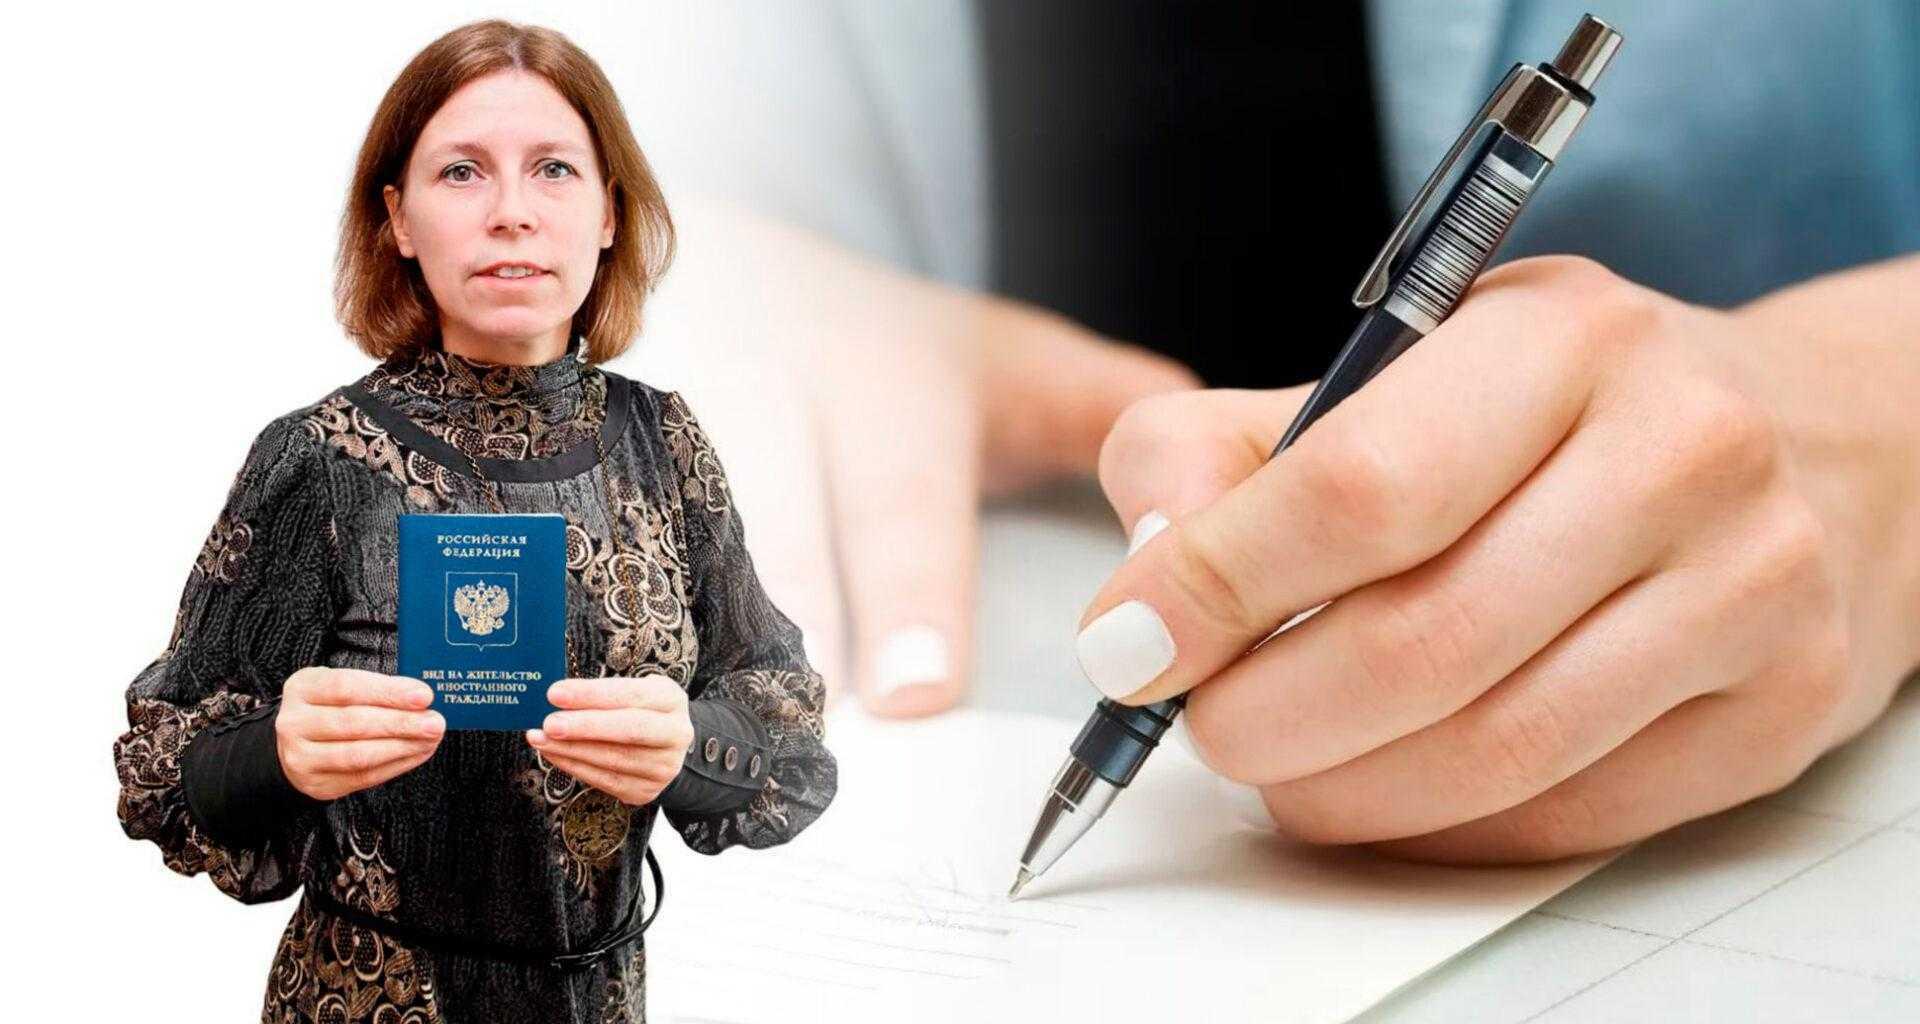 Вид на жительство для мигрантов тест